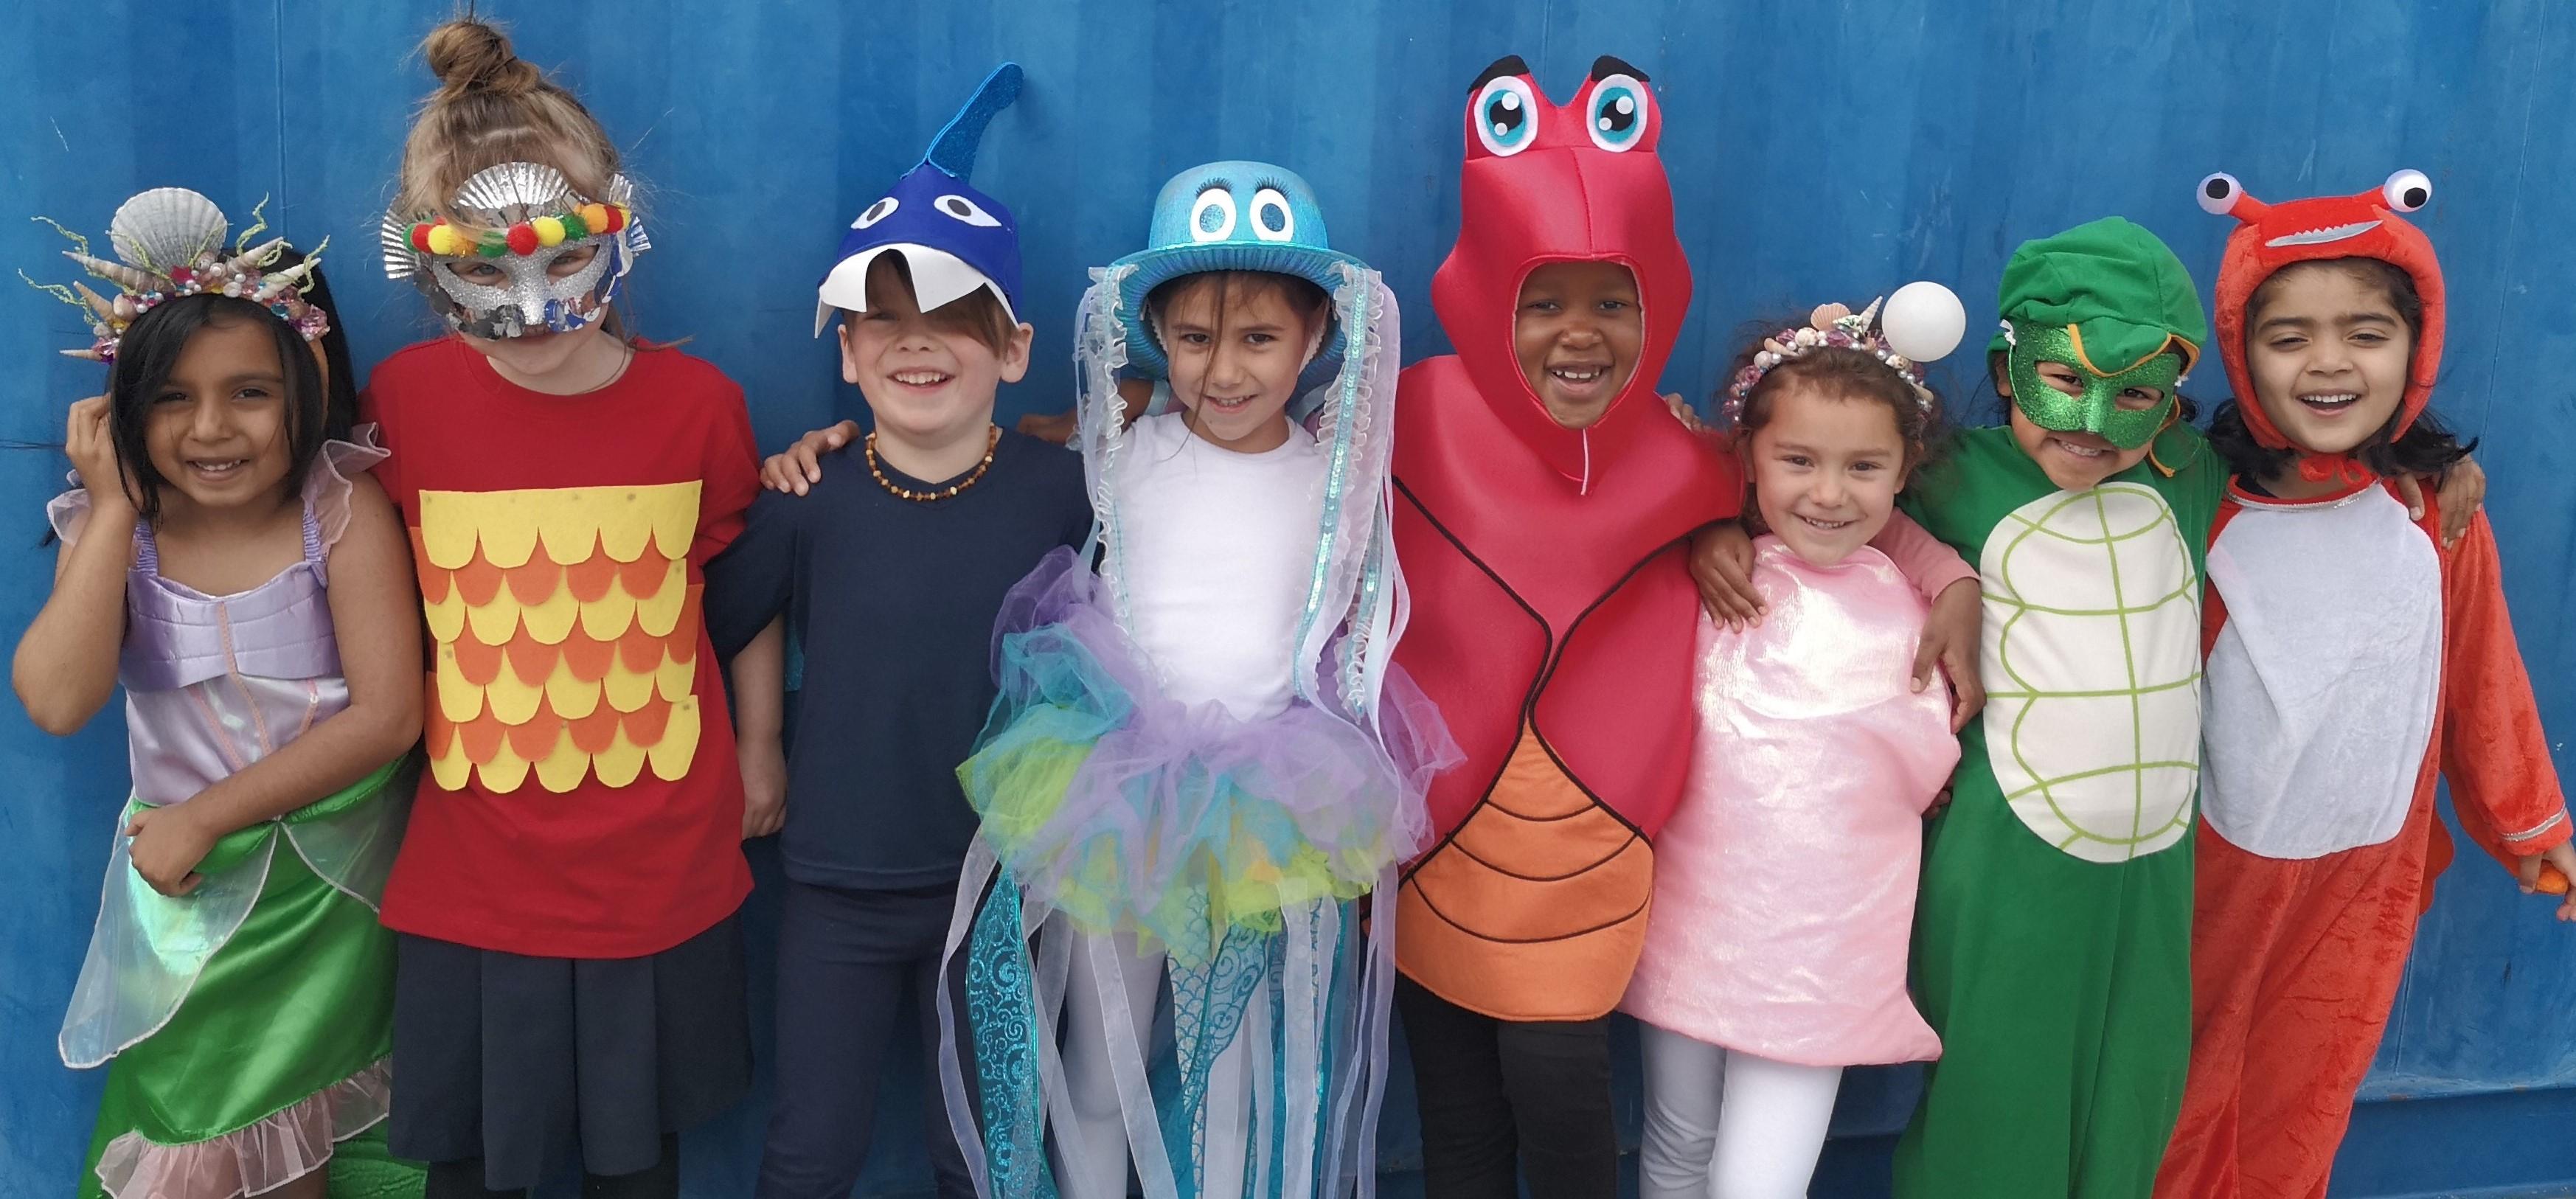 Welcome To Green Bay School | Green Bay School With Regard To Green Bay School District Calendar